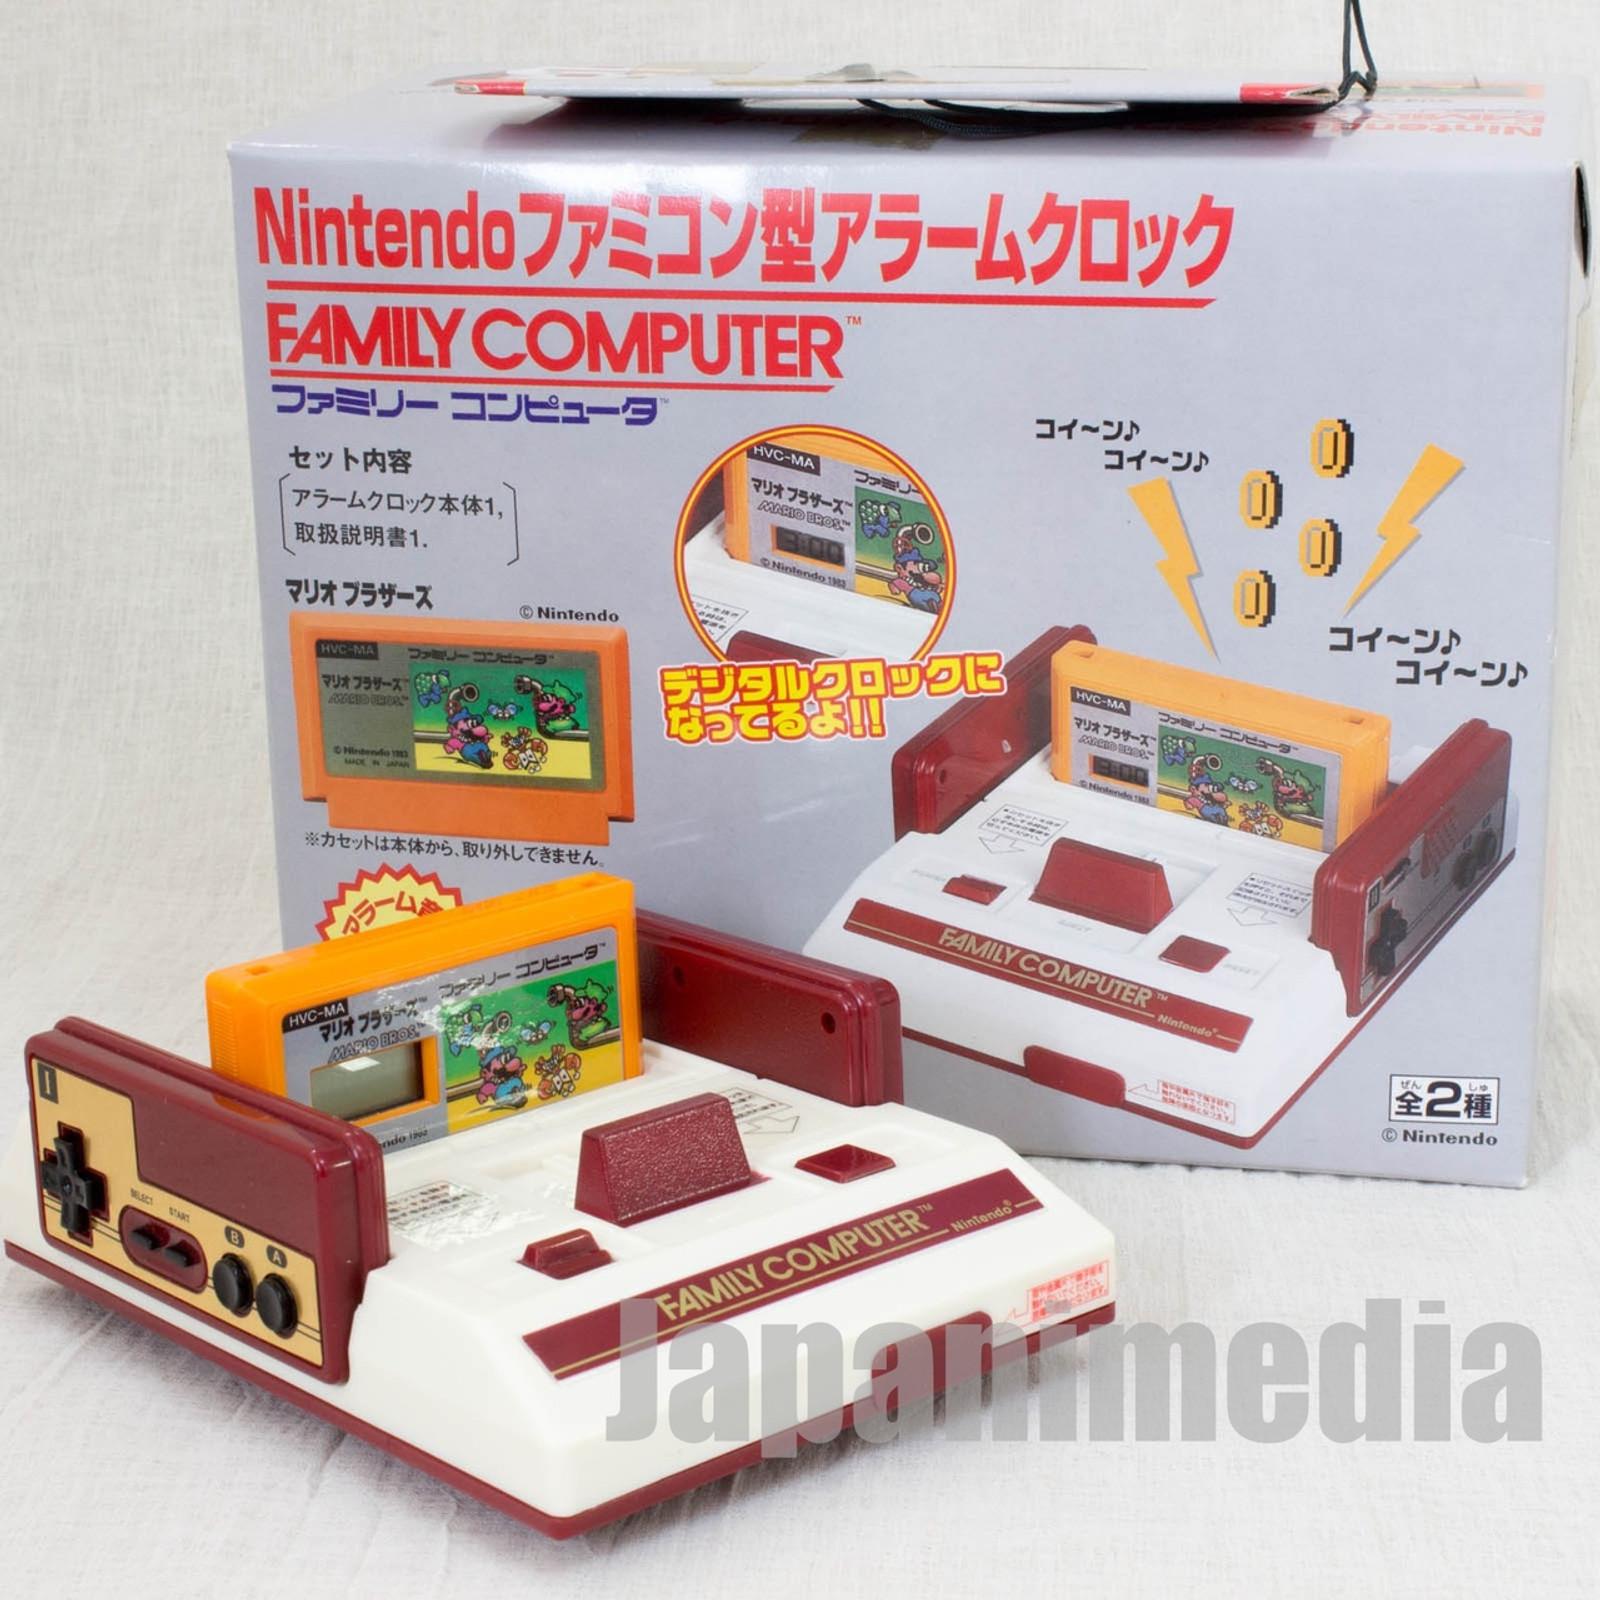 Nintendo Famicom Type Figure Alarm Clock Mario Bro. Ver. Banpresto JAPAN